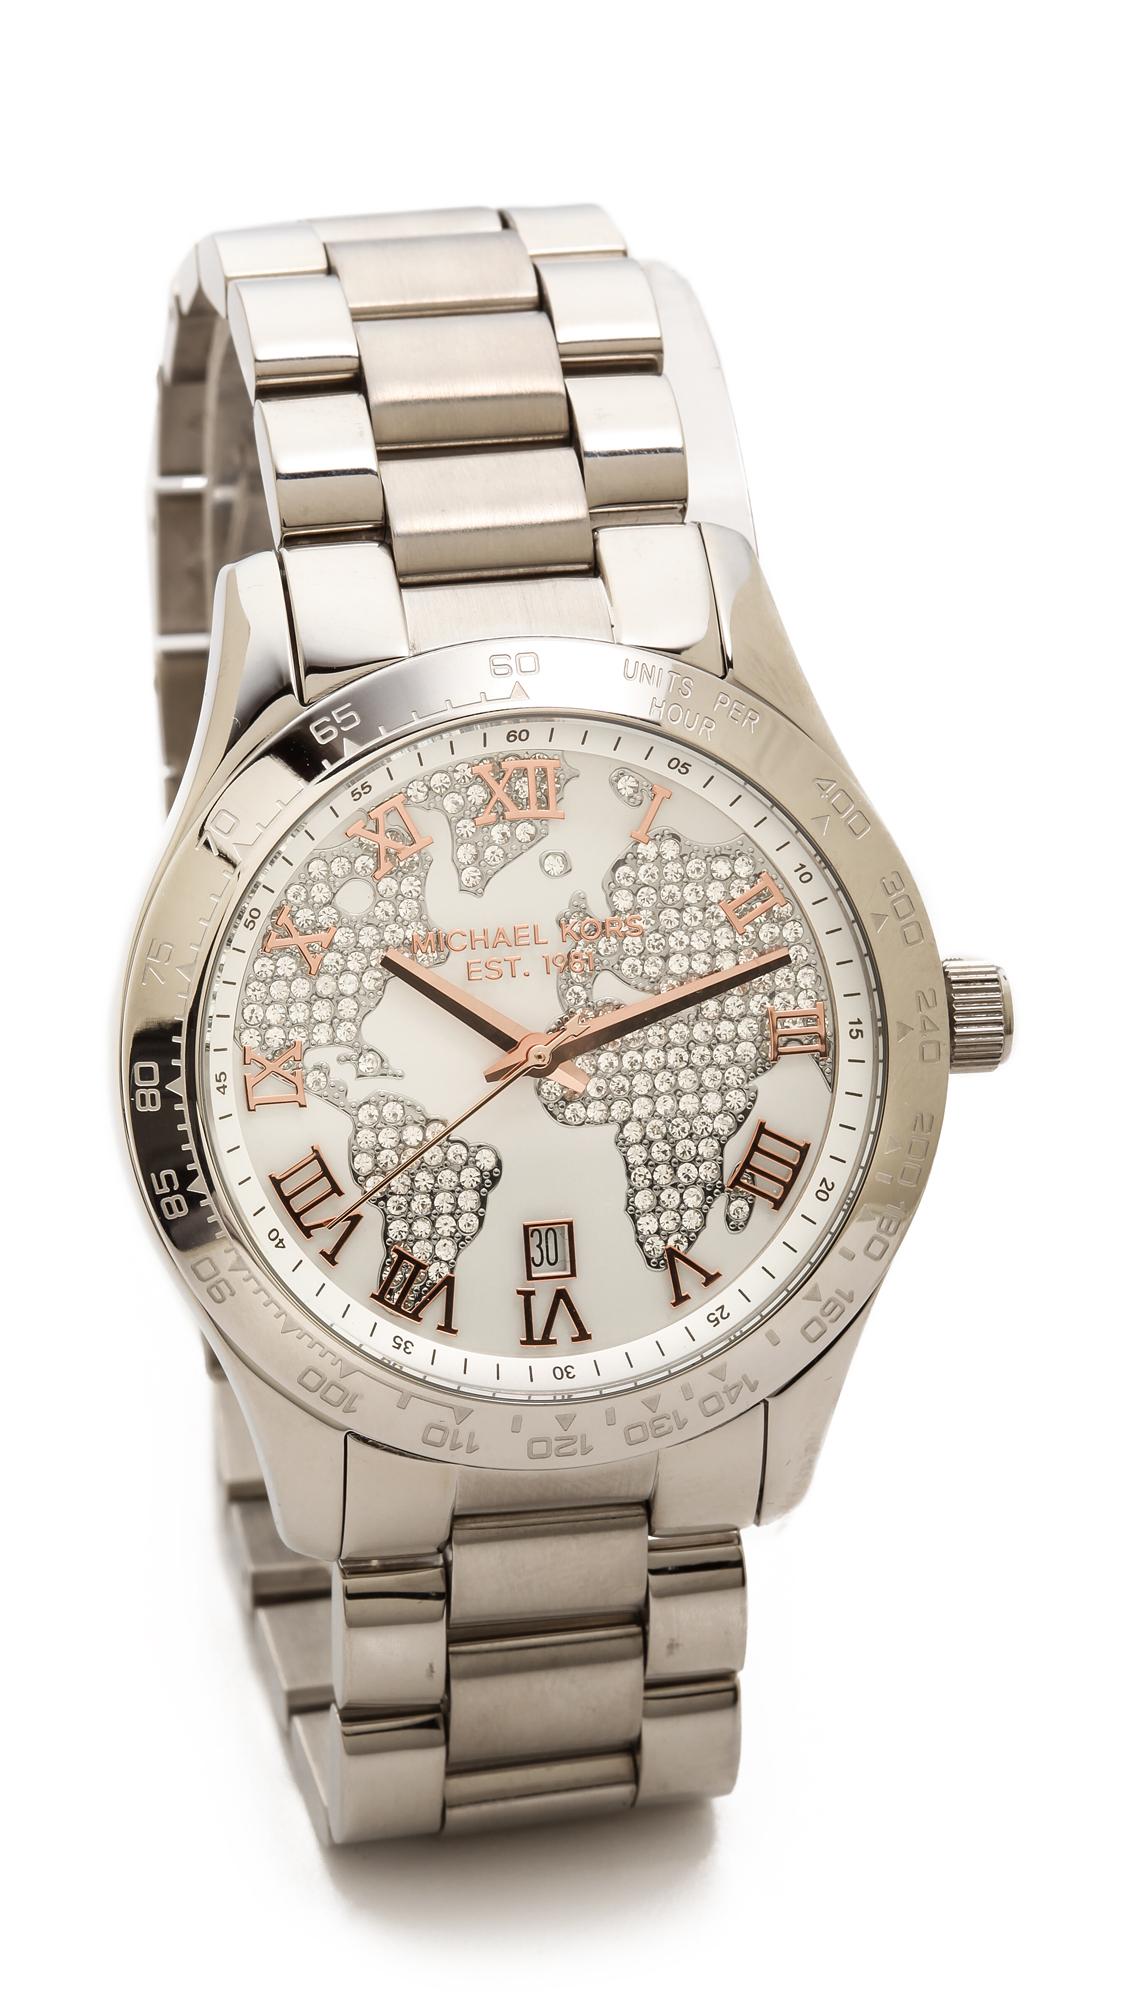 Michael kors global glam layton watch shopbop gumiabroncs Gallery